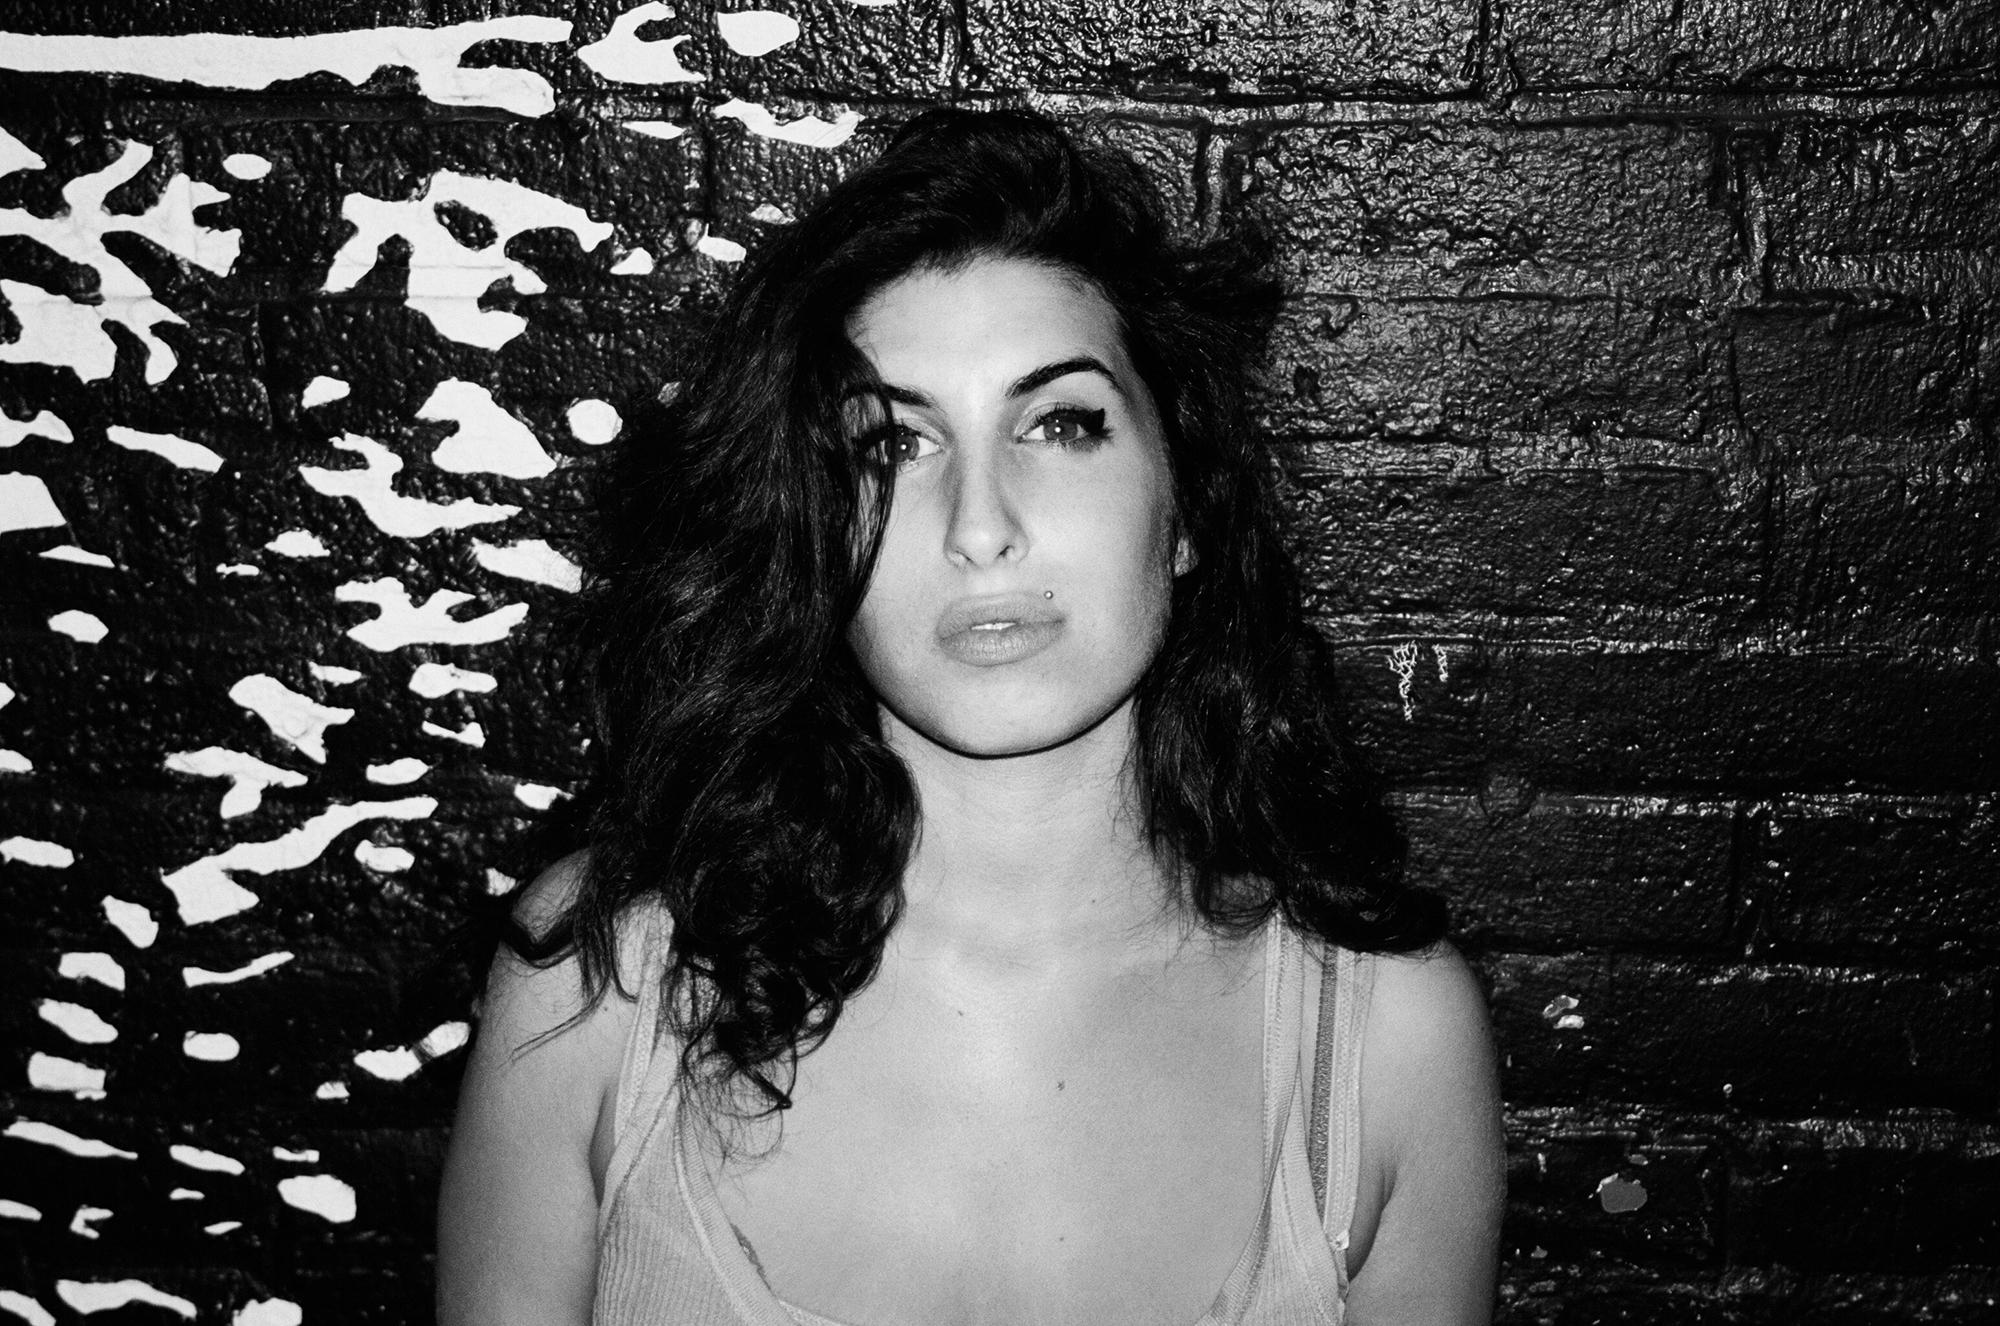 Amy Winehouse Wallpaper For Windows